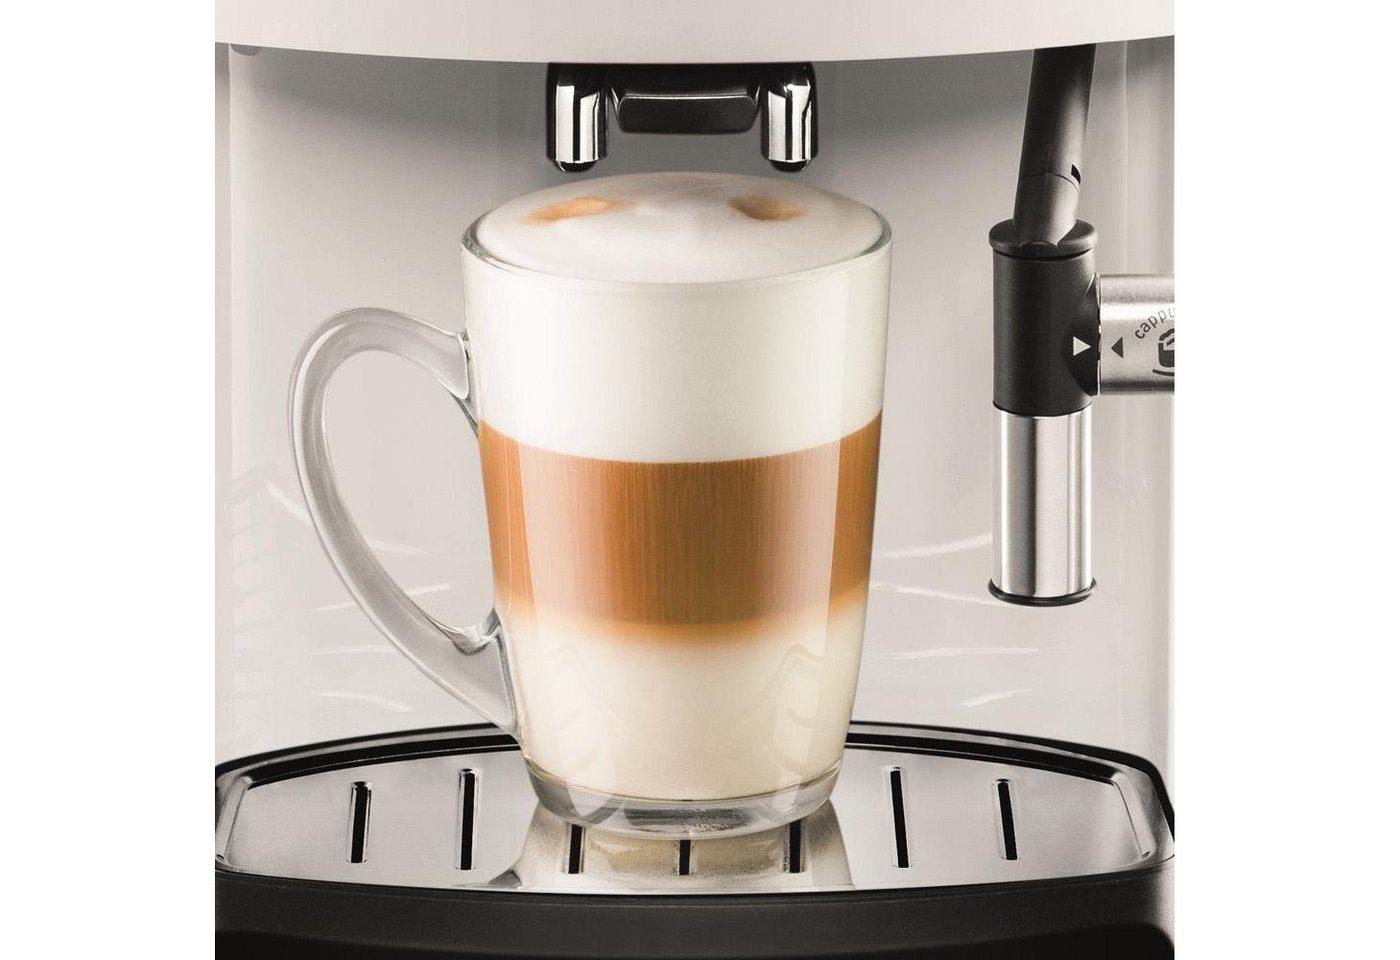 Krups Kaffeevollautomat EA8161, 1,8l Tank, Kegelmahlwerk, inkl. Edelstahl-Milchbehälter